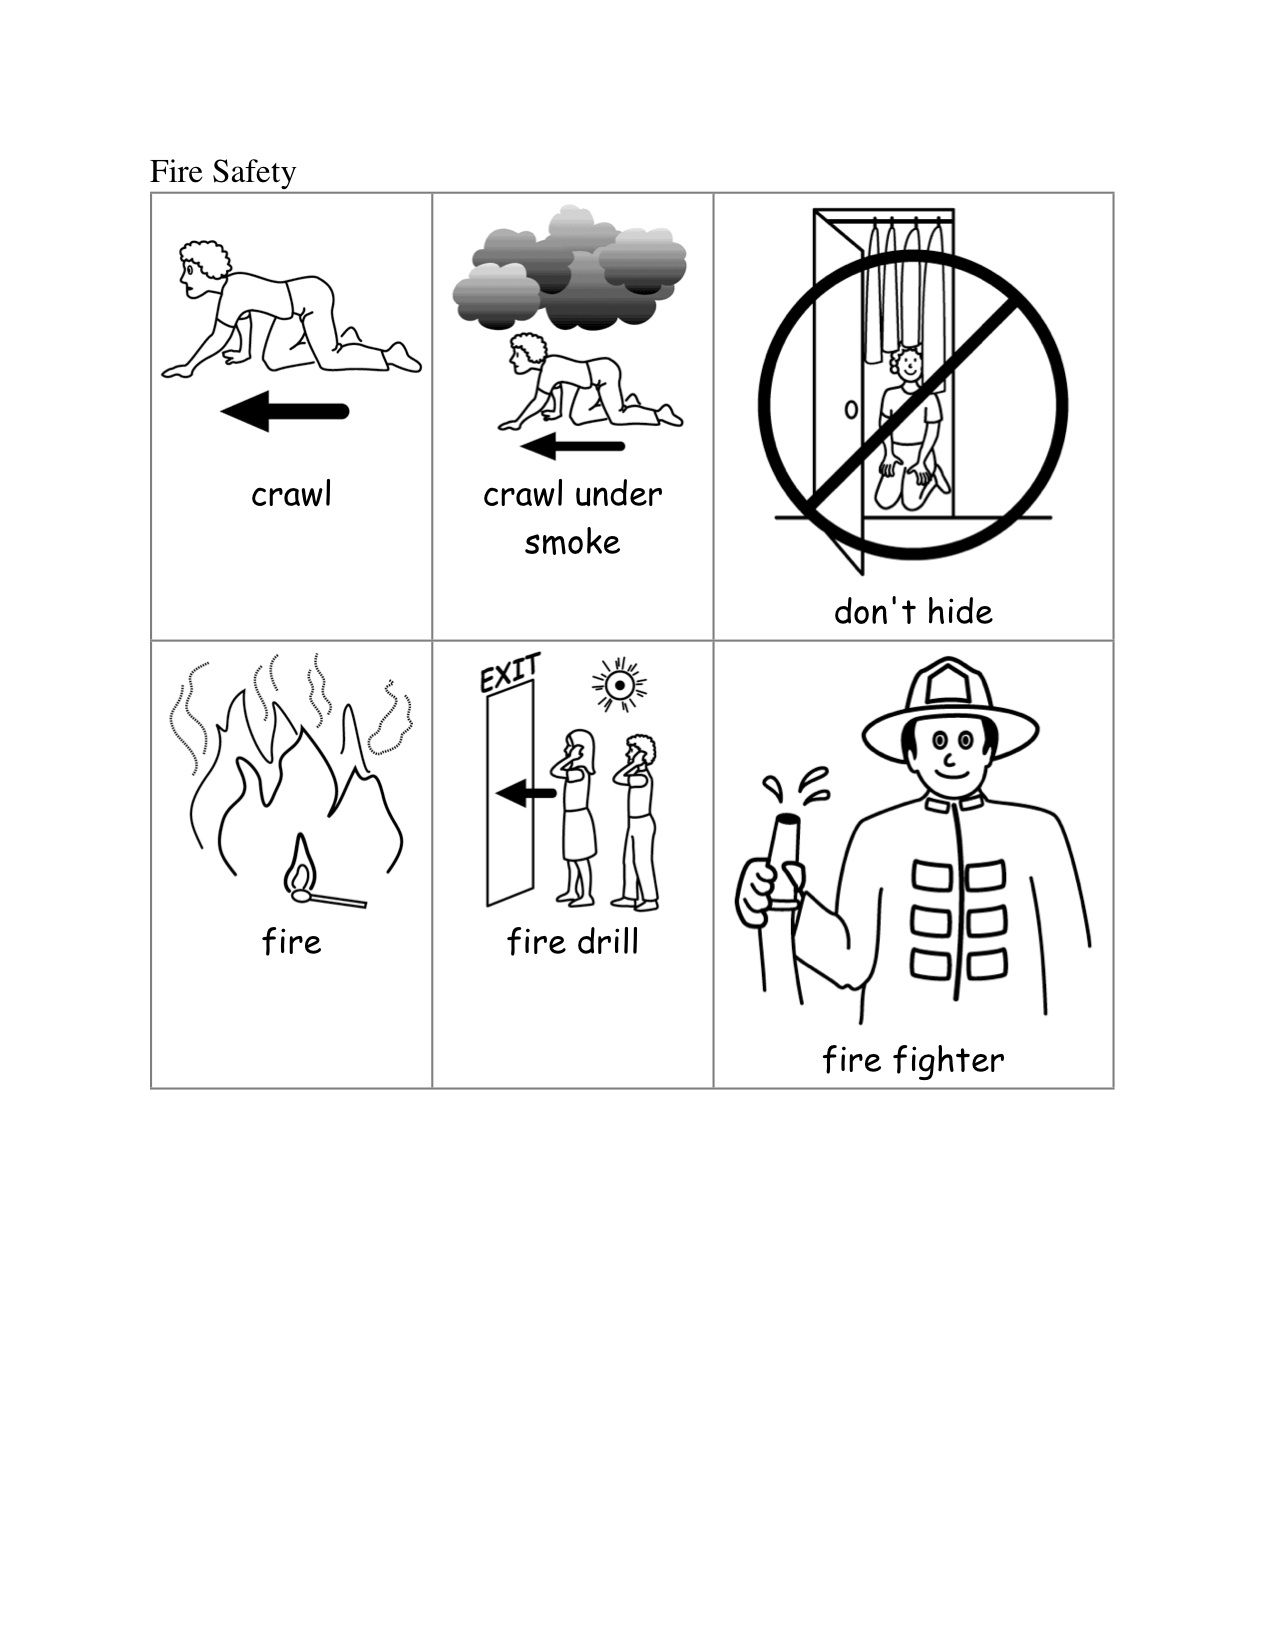 Fire Safety Kindergarten Nana Fire Safety Worksheets Kindergarten Special Education Fire Safety Kindergarten [ 1650 x 1275 Pixel ]